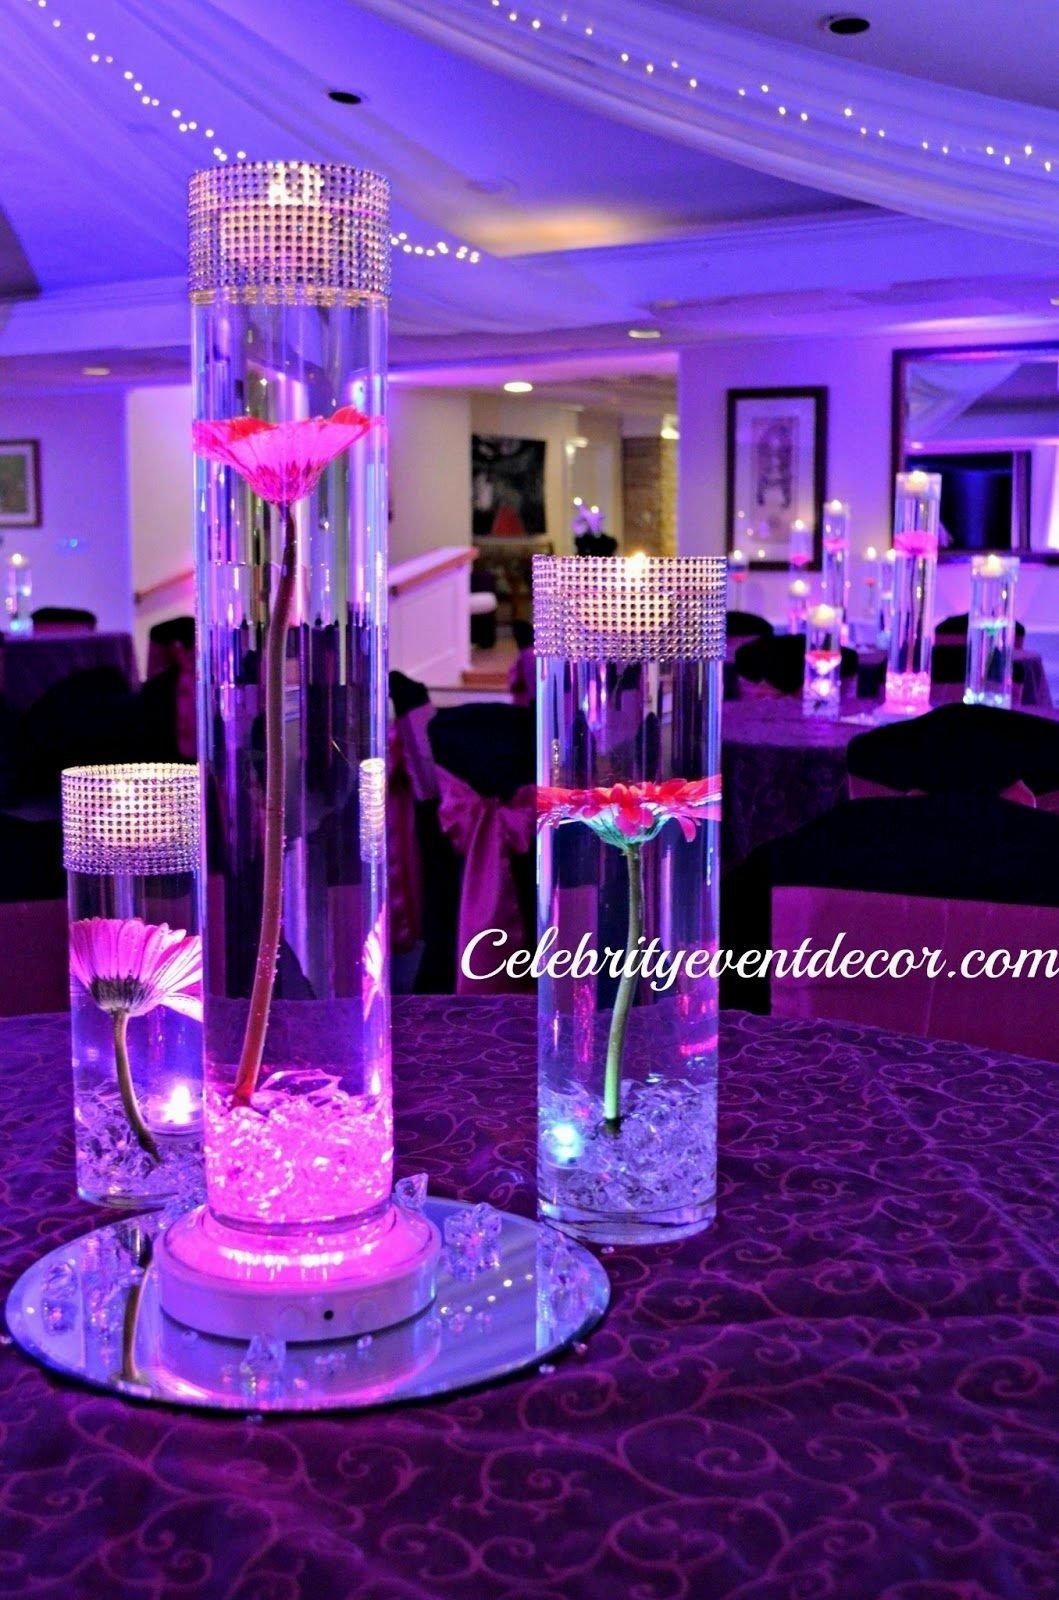 10 Fabulous Sweet Sixteen Birthday Party Ideas ideas for sweet 16 birthday party themes decorating of party 3 2021